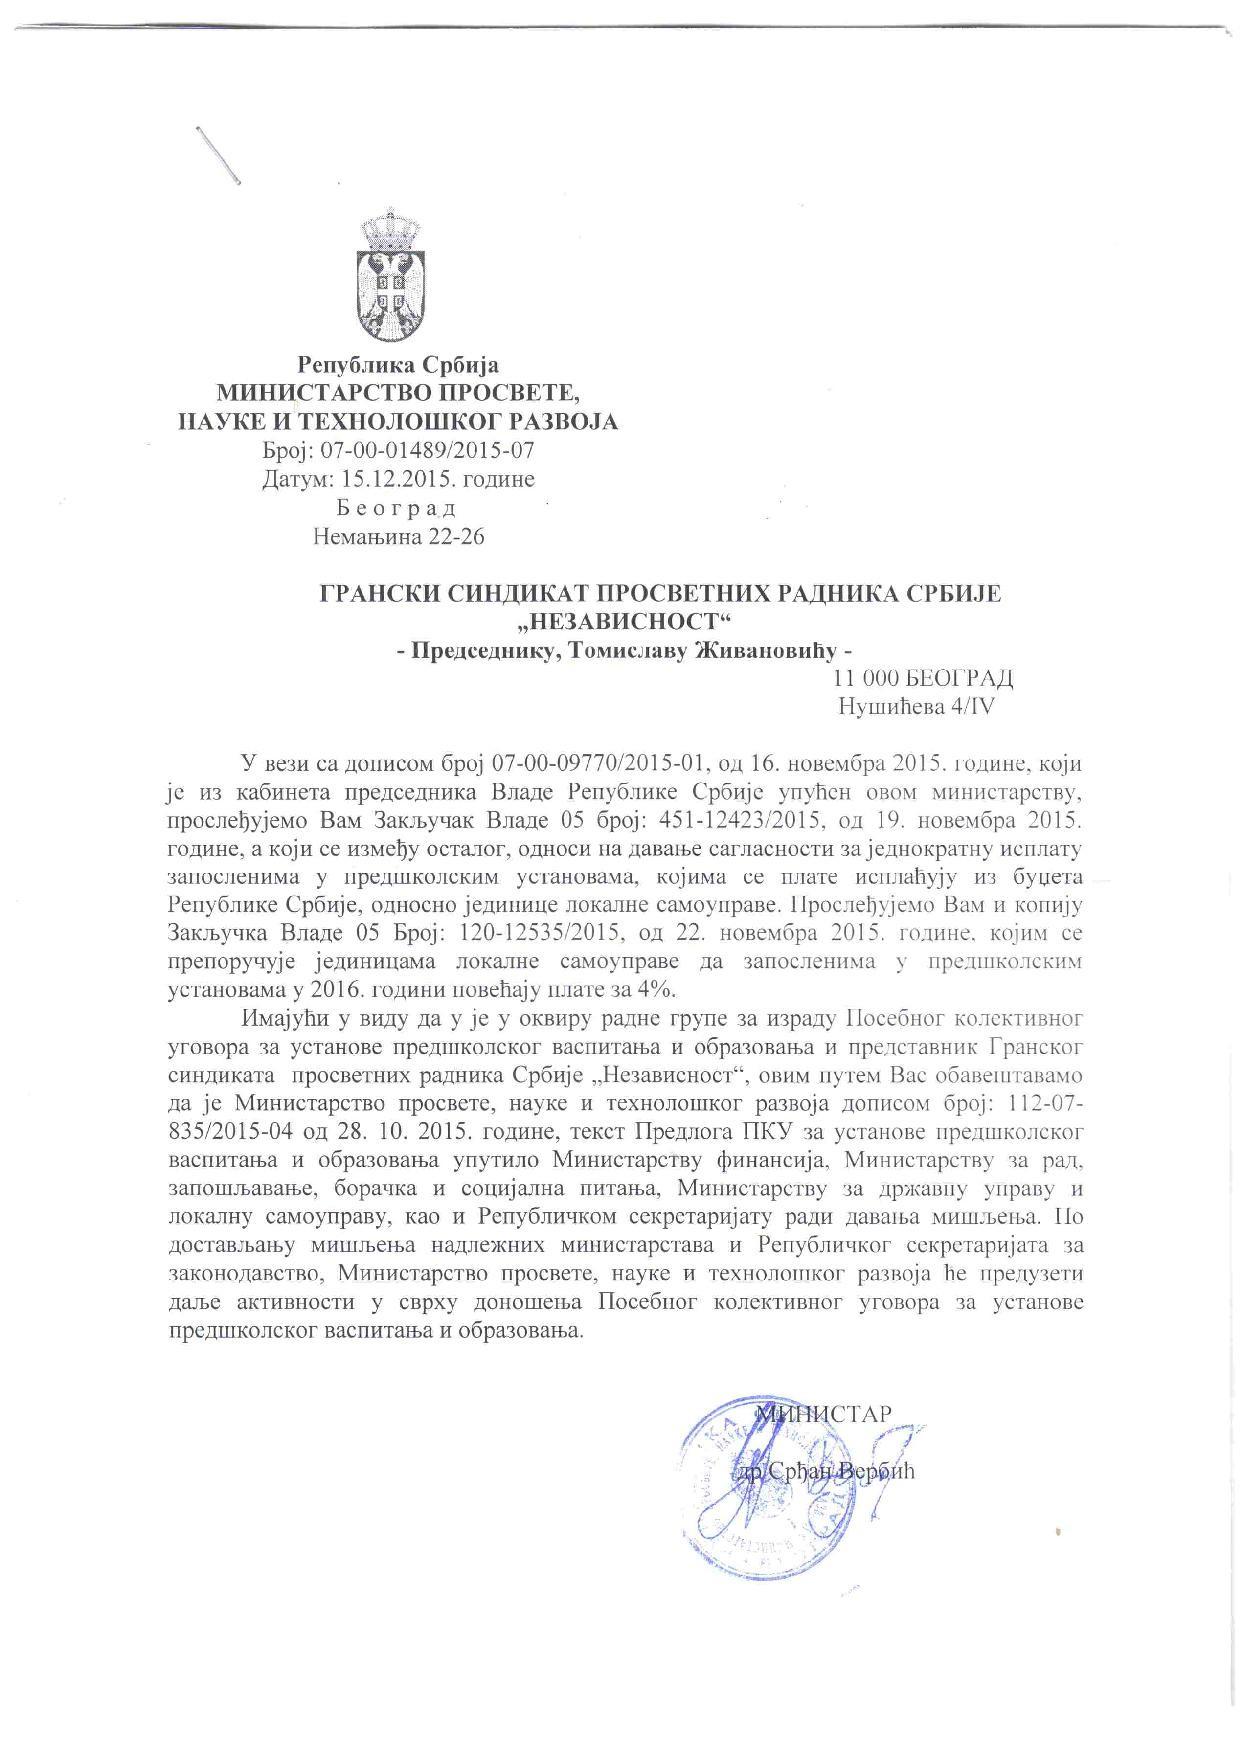 1. Dopis Ministra prosvete u vezi sa PU 22.12.2015-page-001